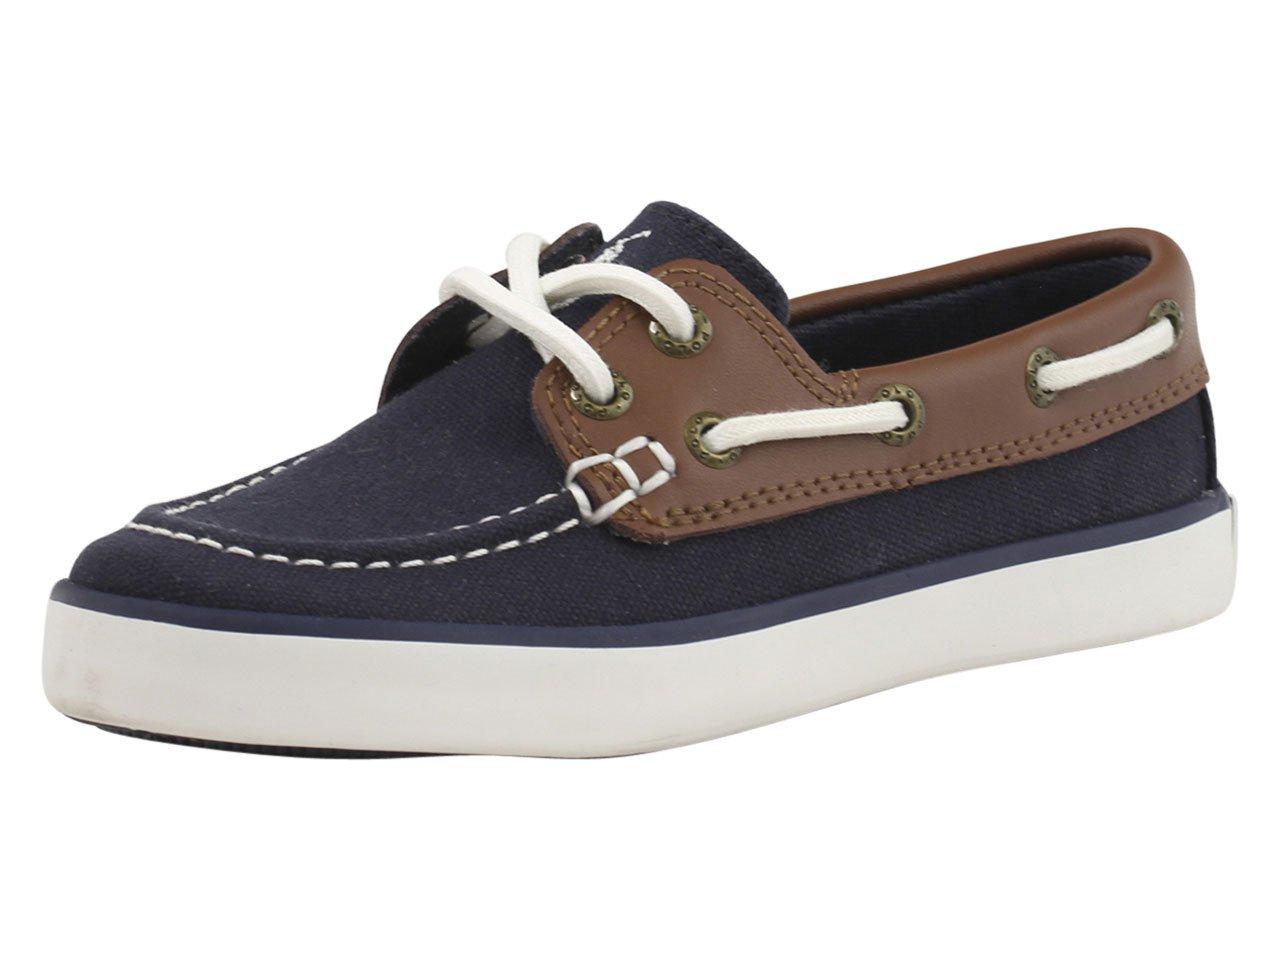 Polo Ralph Lauren Kids Sander-CL Sneaker (Toddler/Little Kid/Big Kid),Navy/Tan,5 M US Big Kid